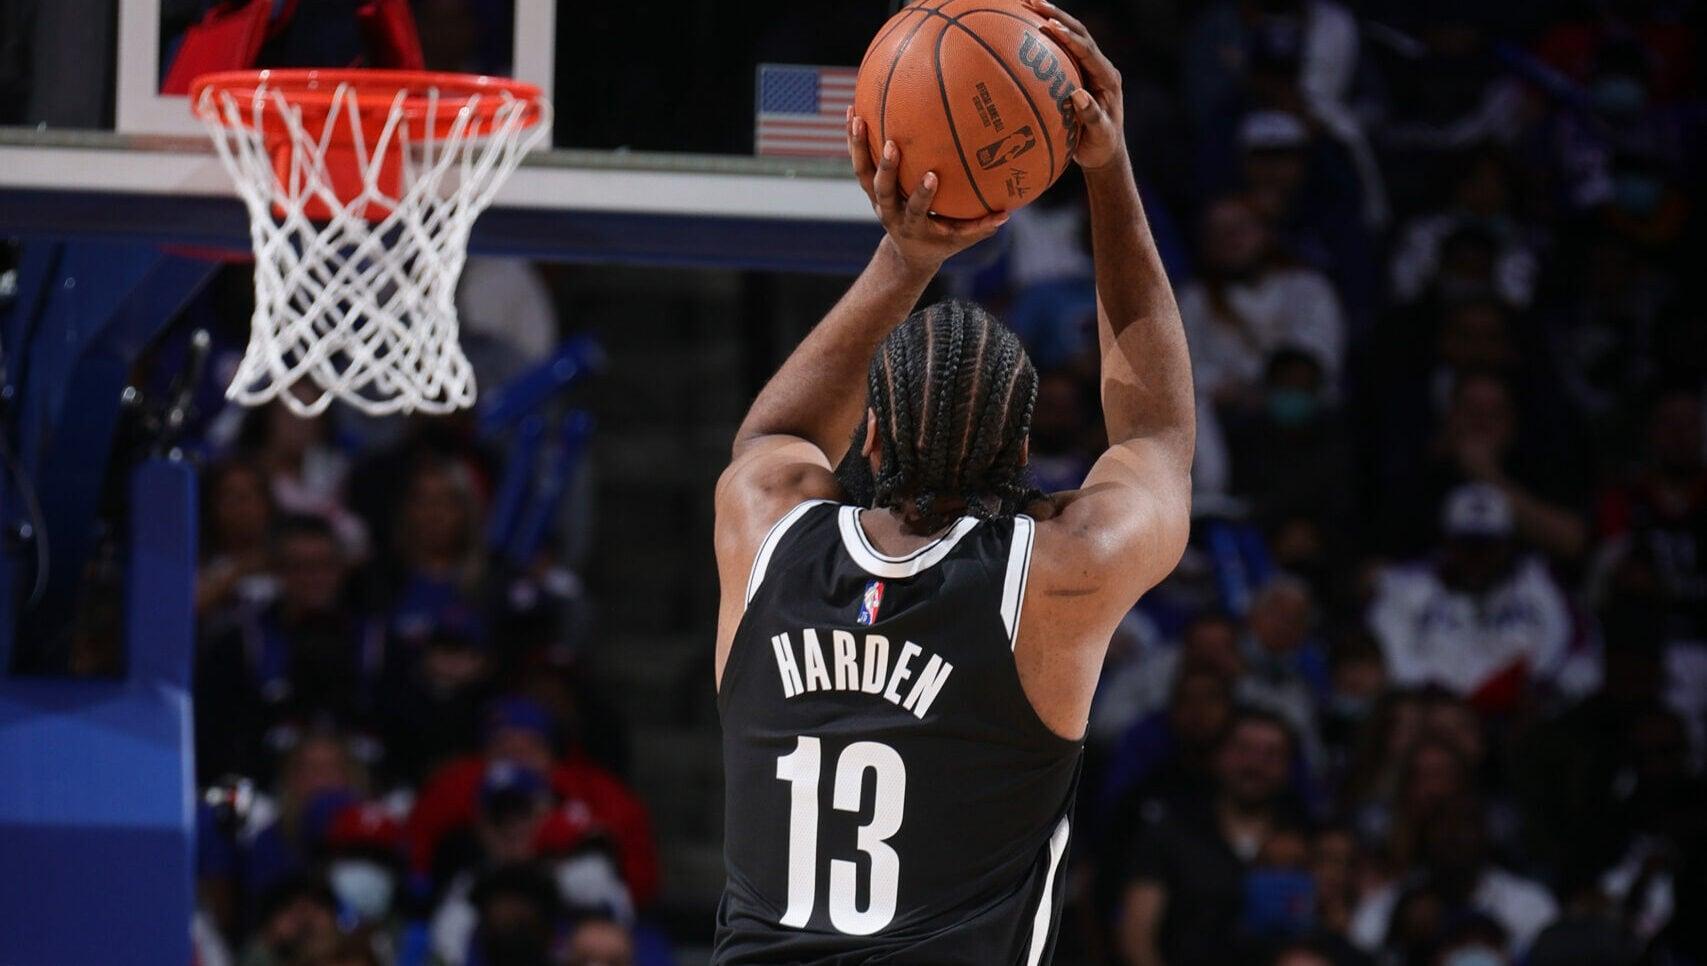 Nets guard James Harden claims 4th on career 3s list